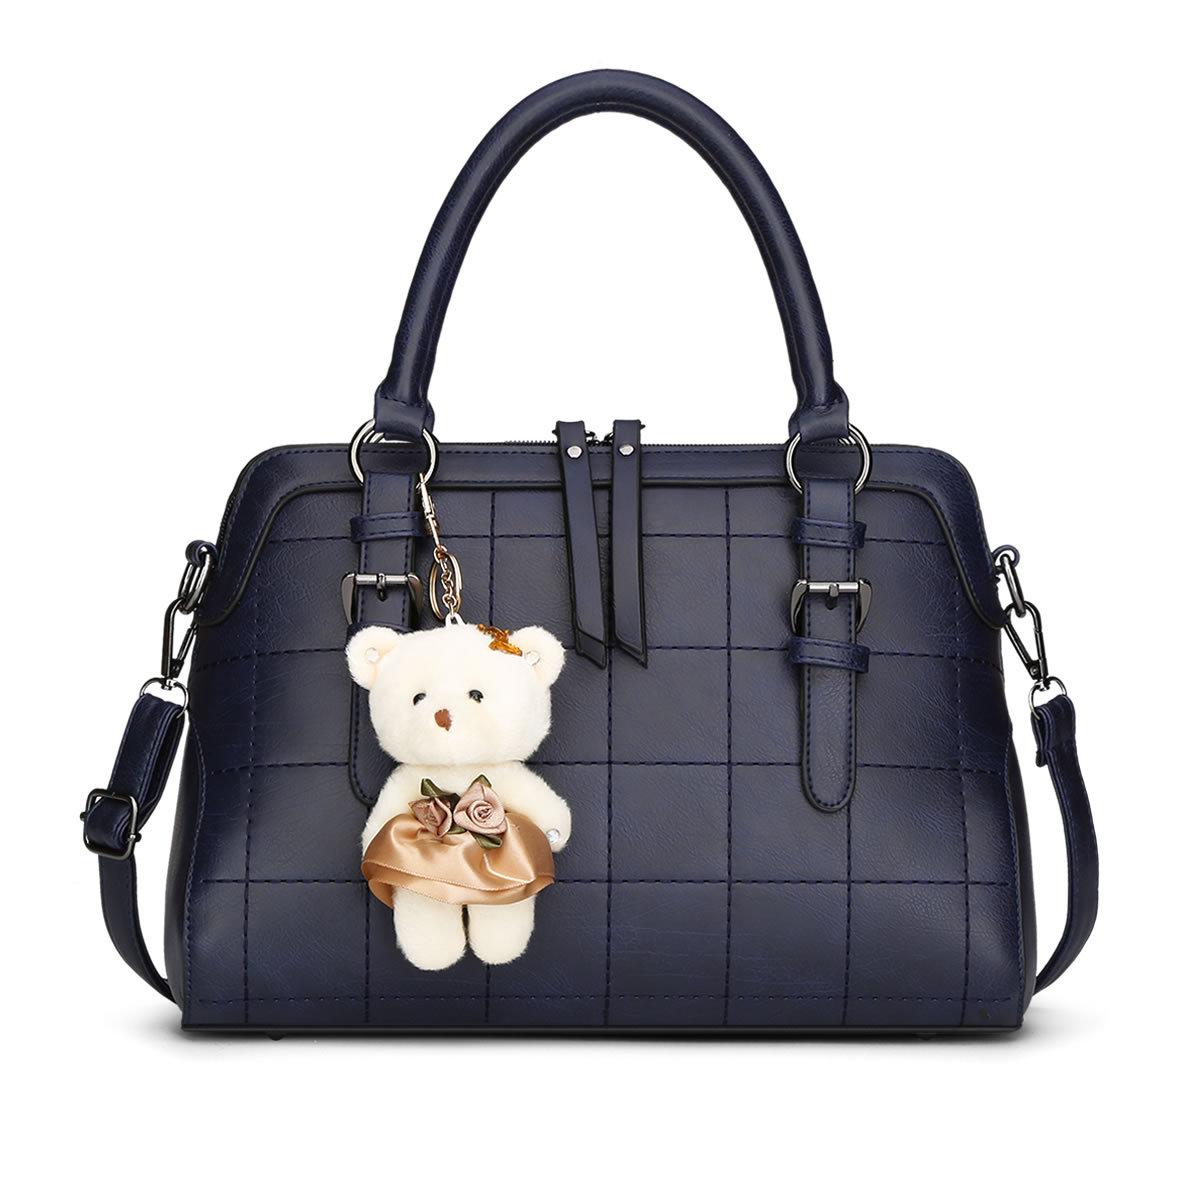 2016 Spring New Plaid Women Shoulder Bag With Bear Toy High Quality European and American Women Bags Vintage Handbag Q5